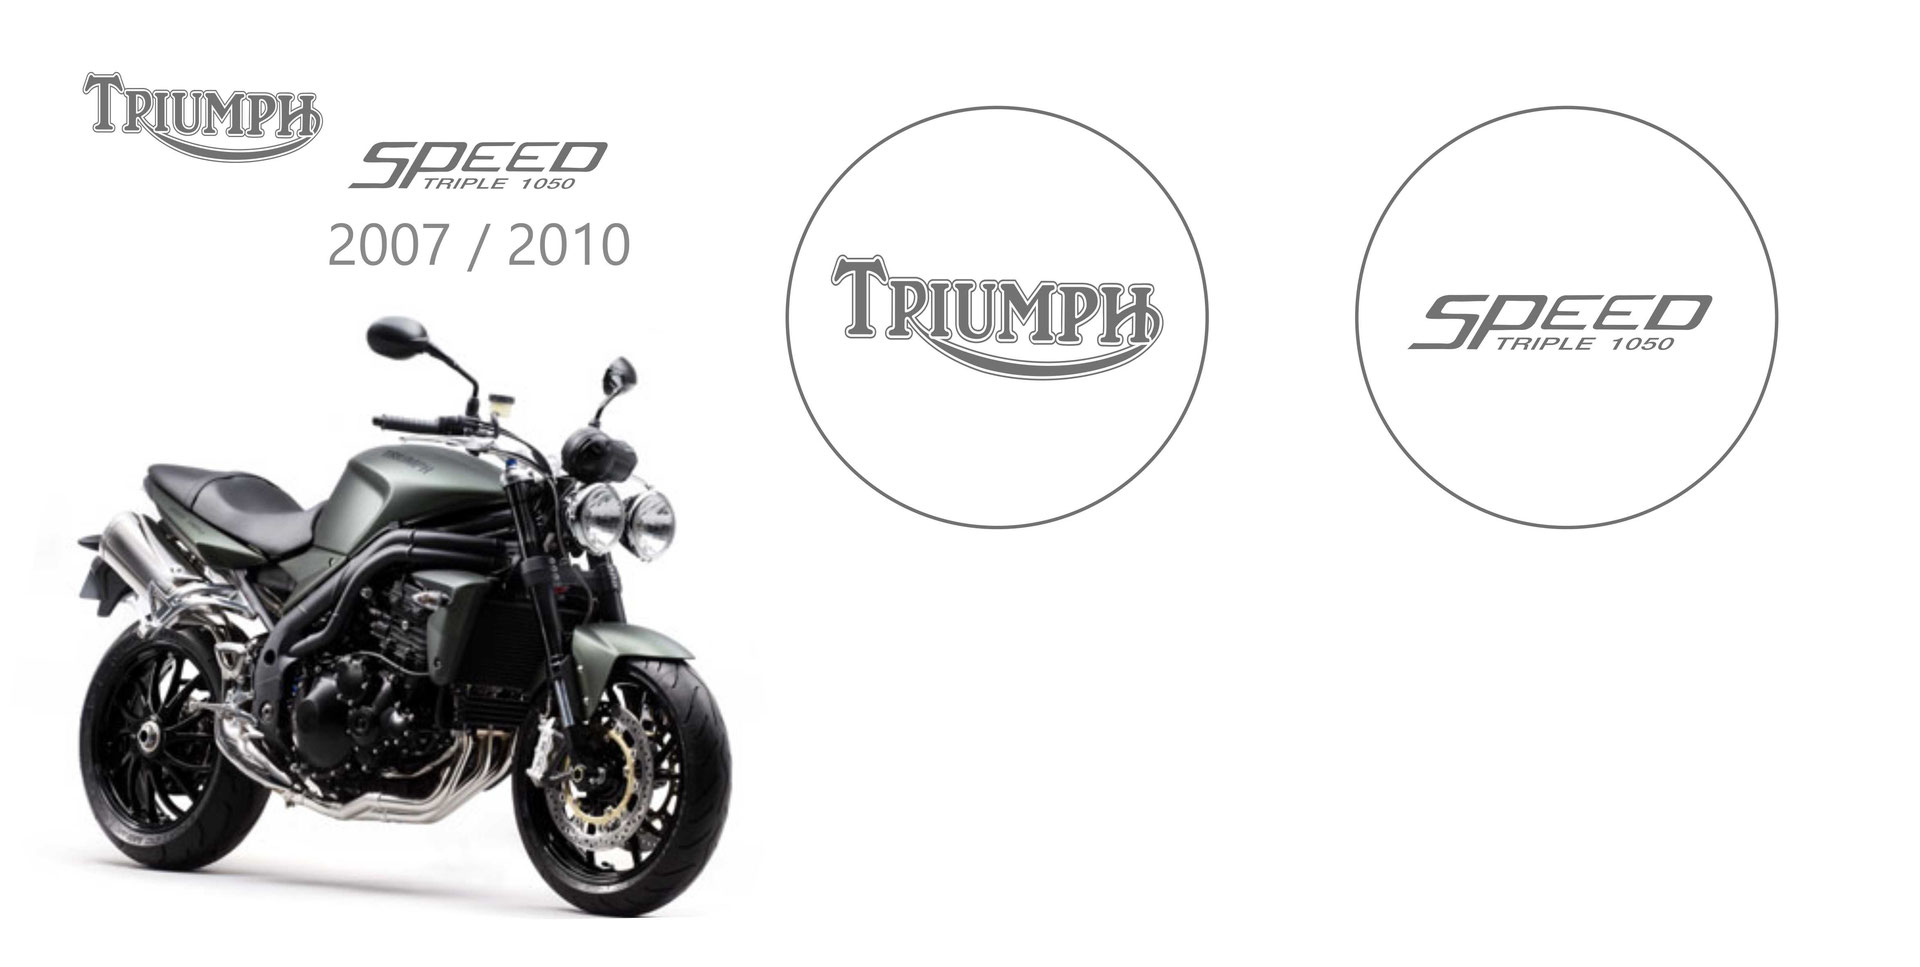 triumph speed triple 2007-2010